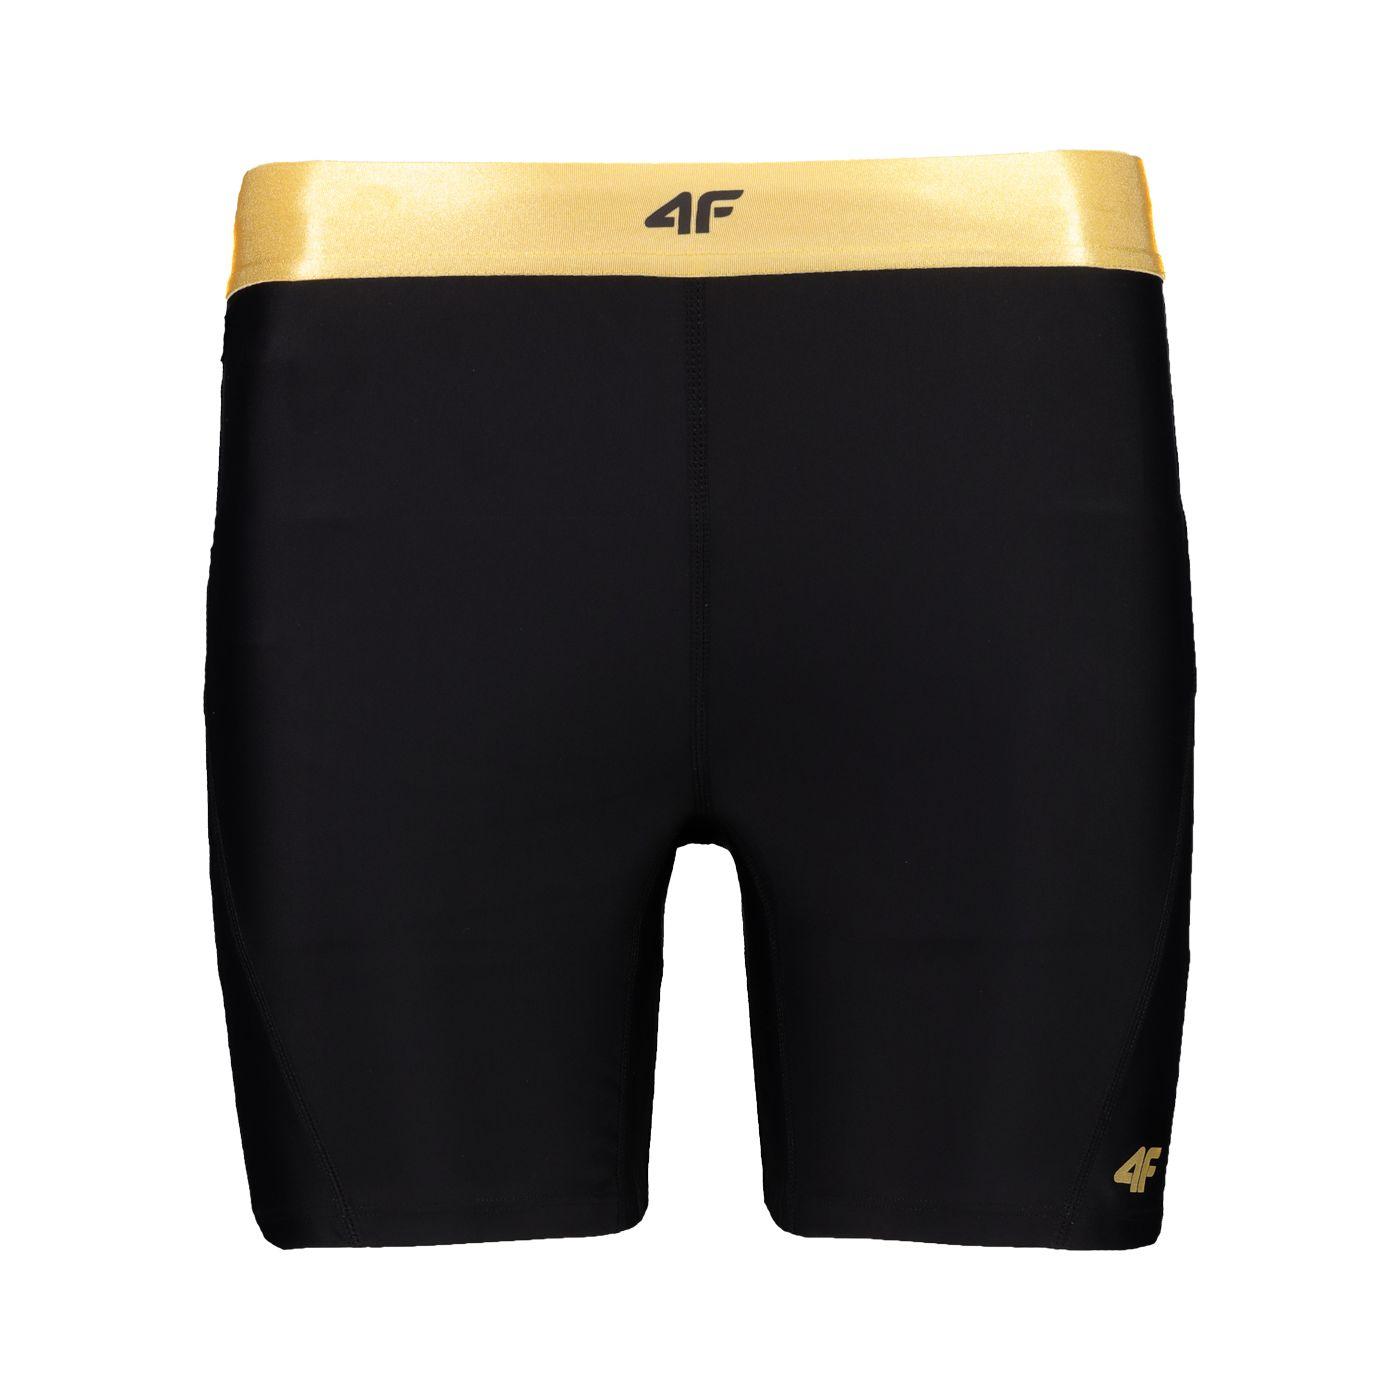 Women's shorts 4F SKDF002